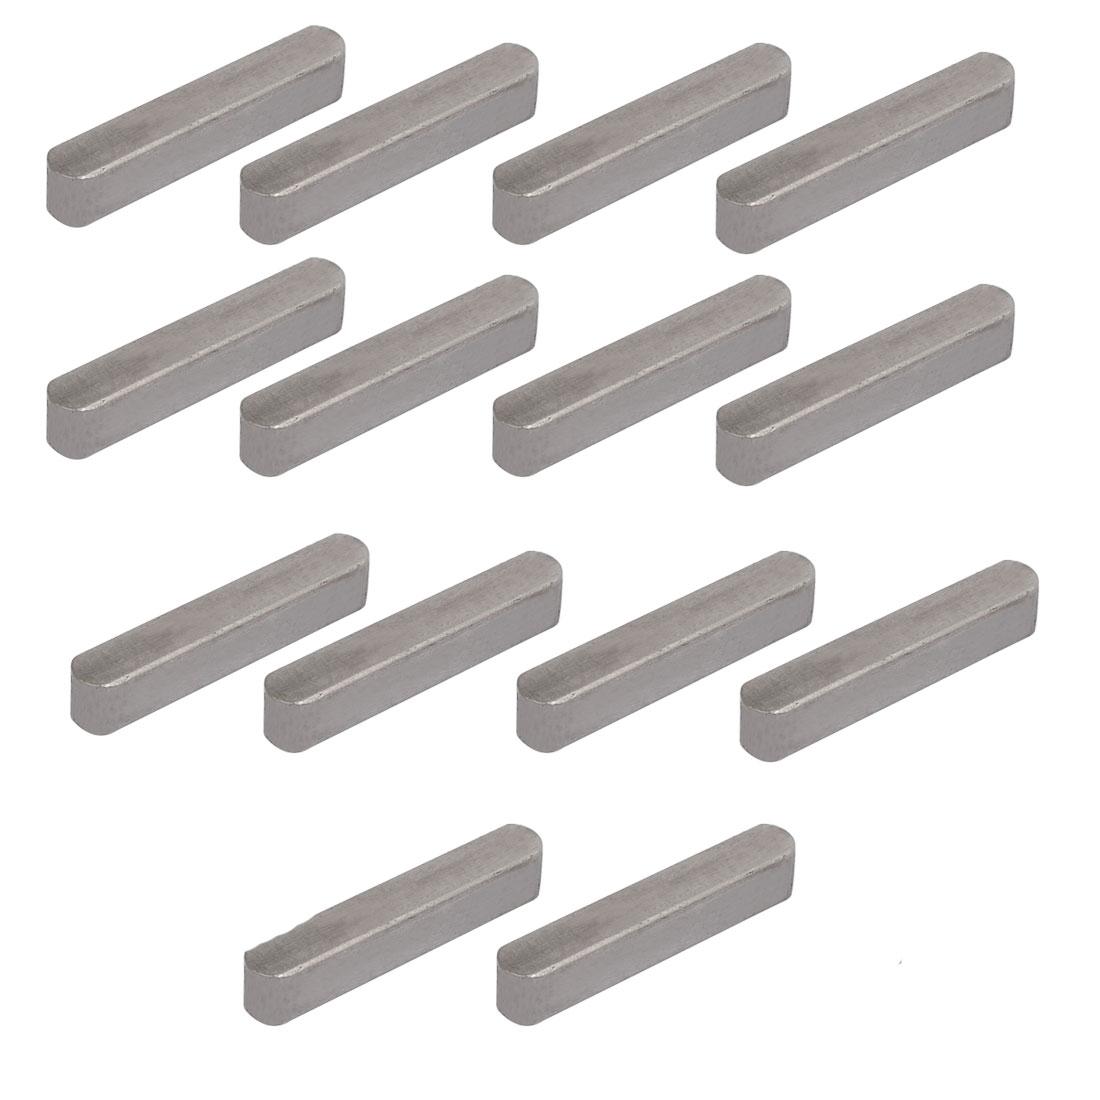 35mmx6mmx6mm Carbon Steel Key Stock To Lock Pulleys 14pcs